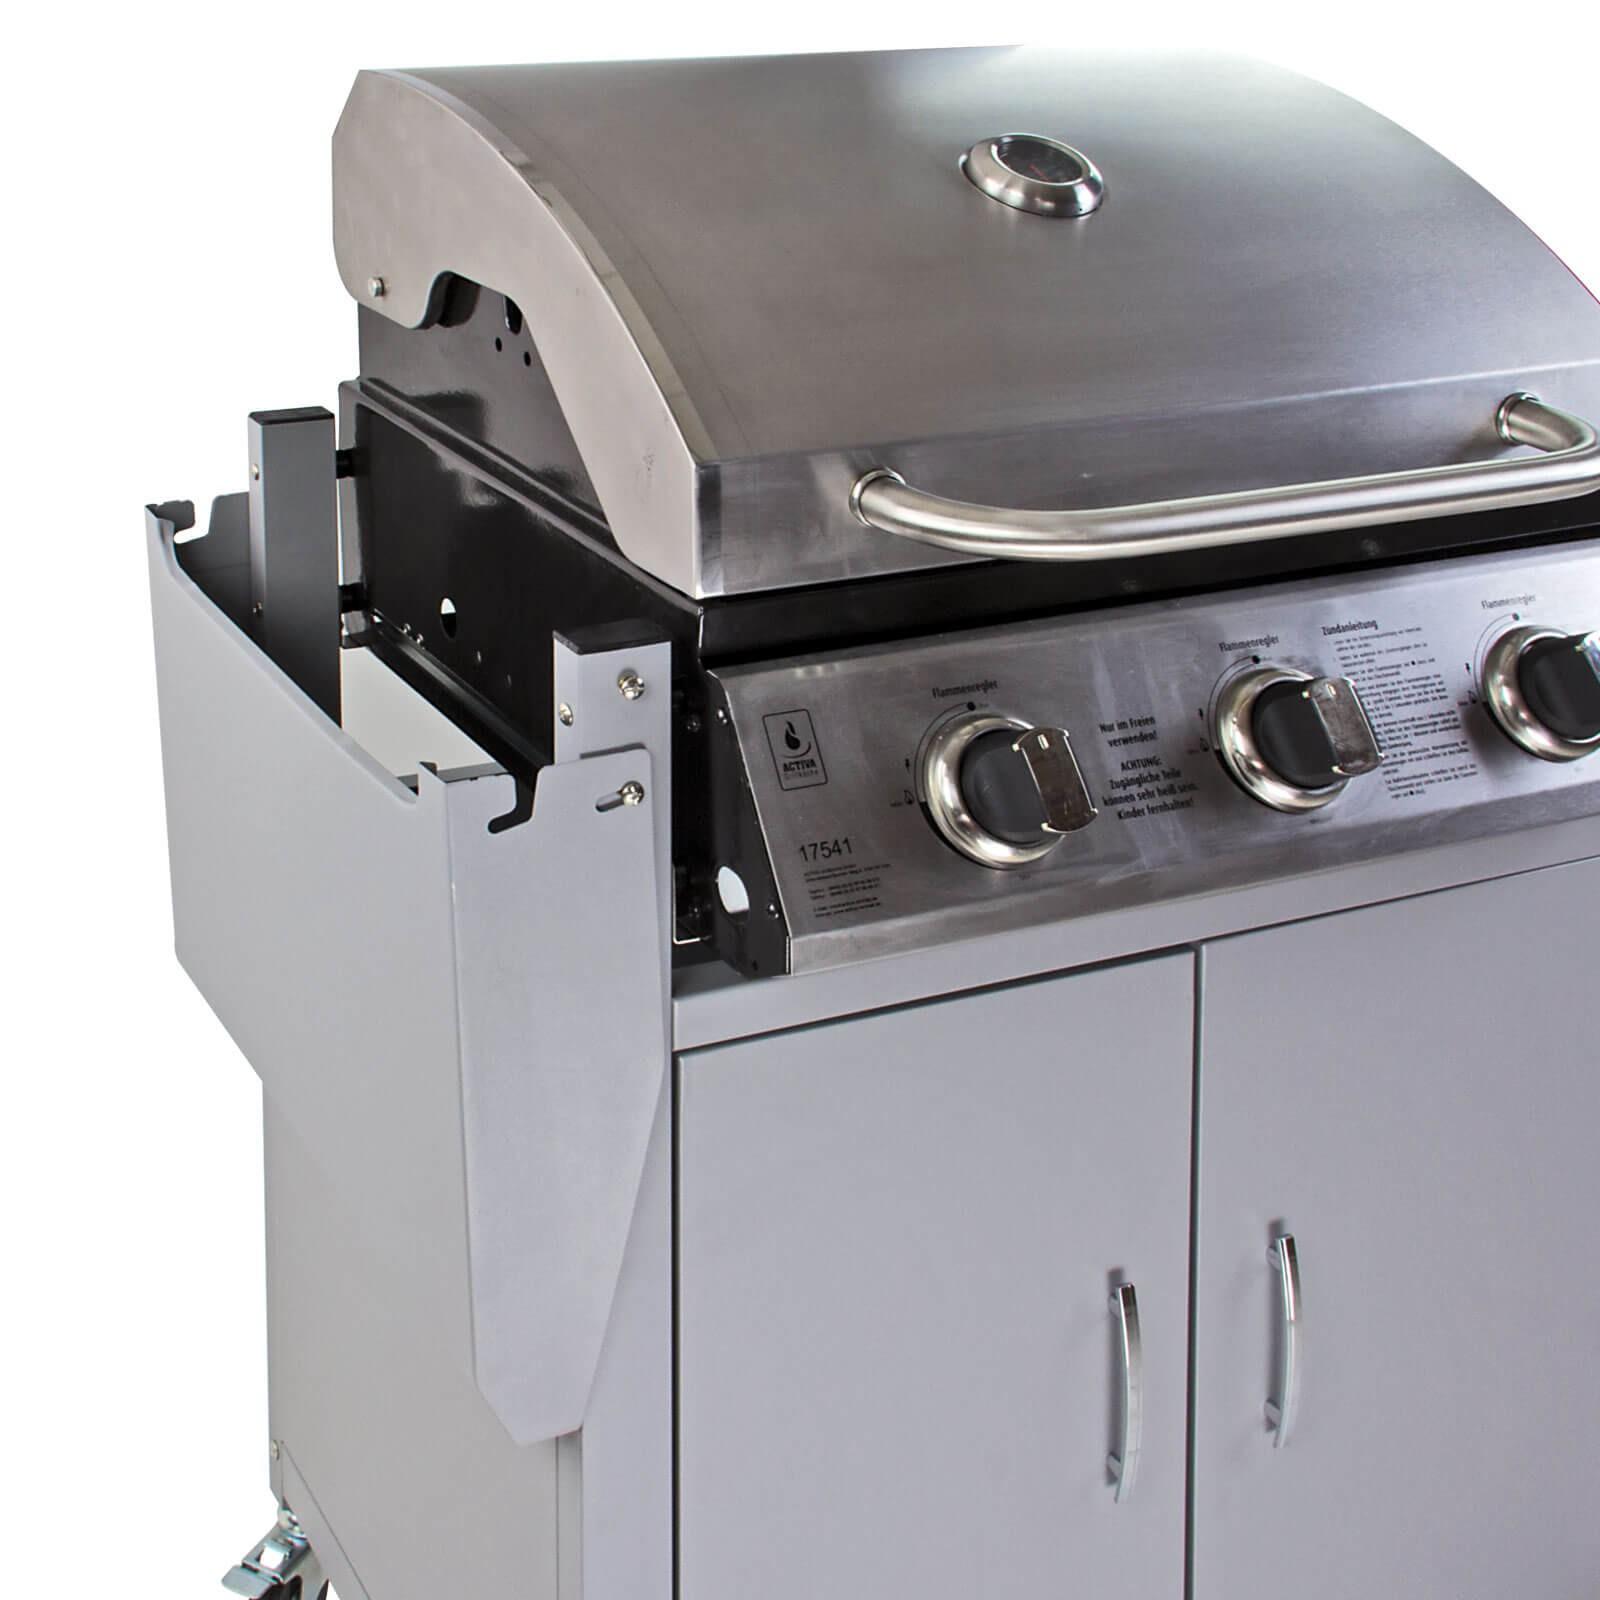 edelstahl gasgrill grillwagen memphis ii. Black Bedroom Furniture Sets. Home Design Ideas